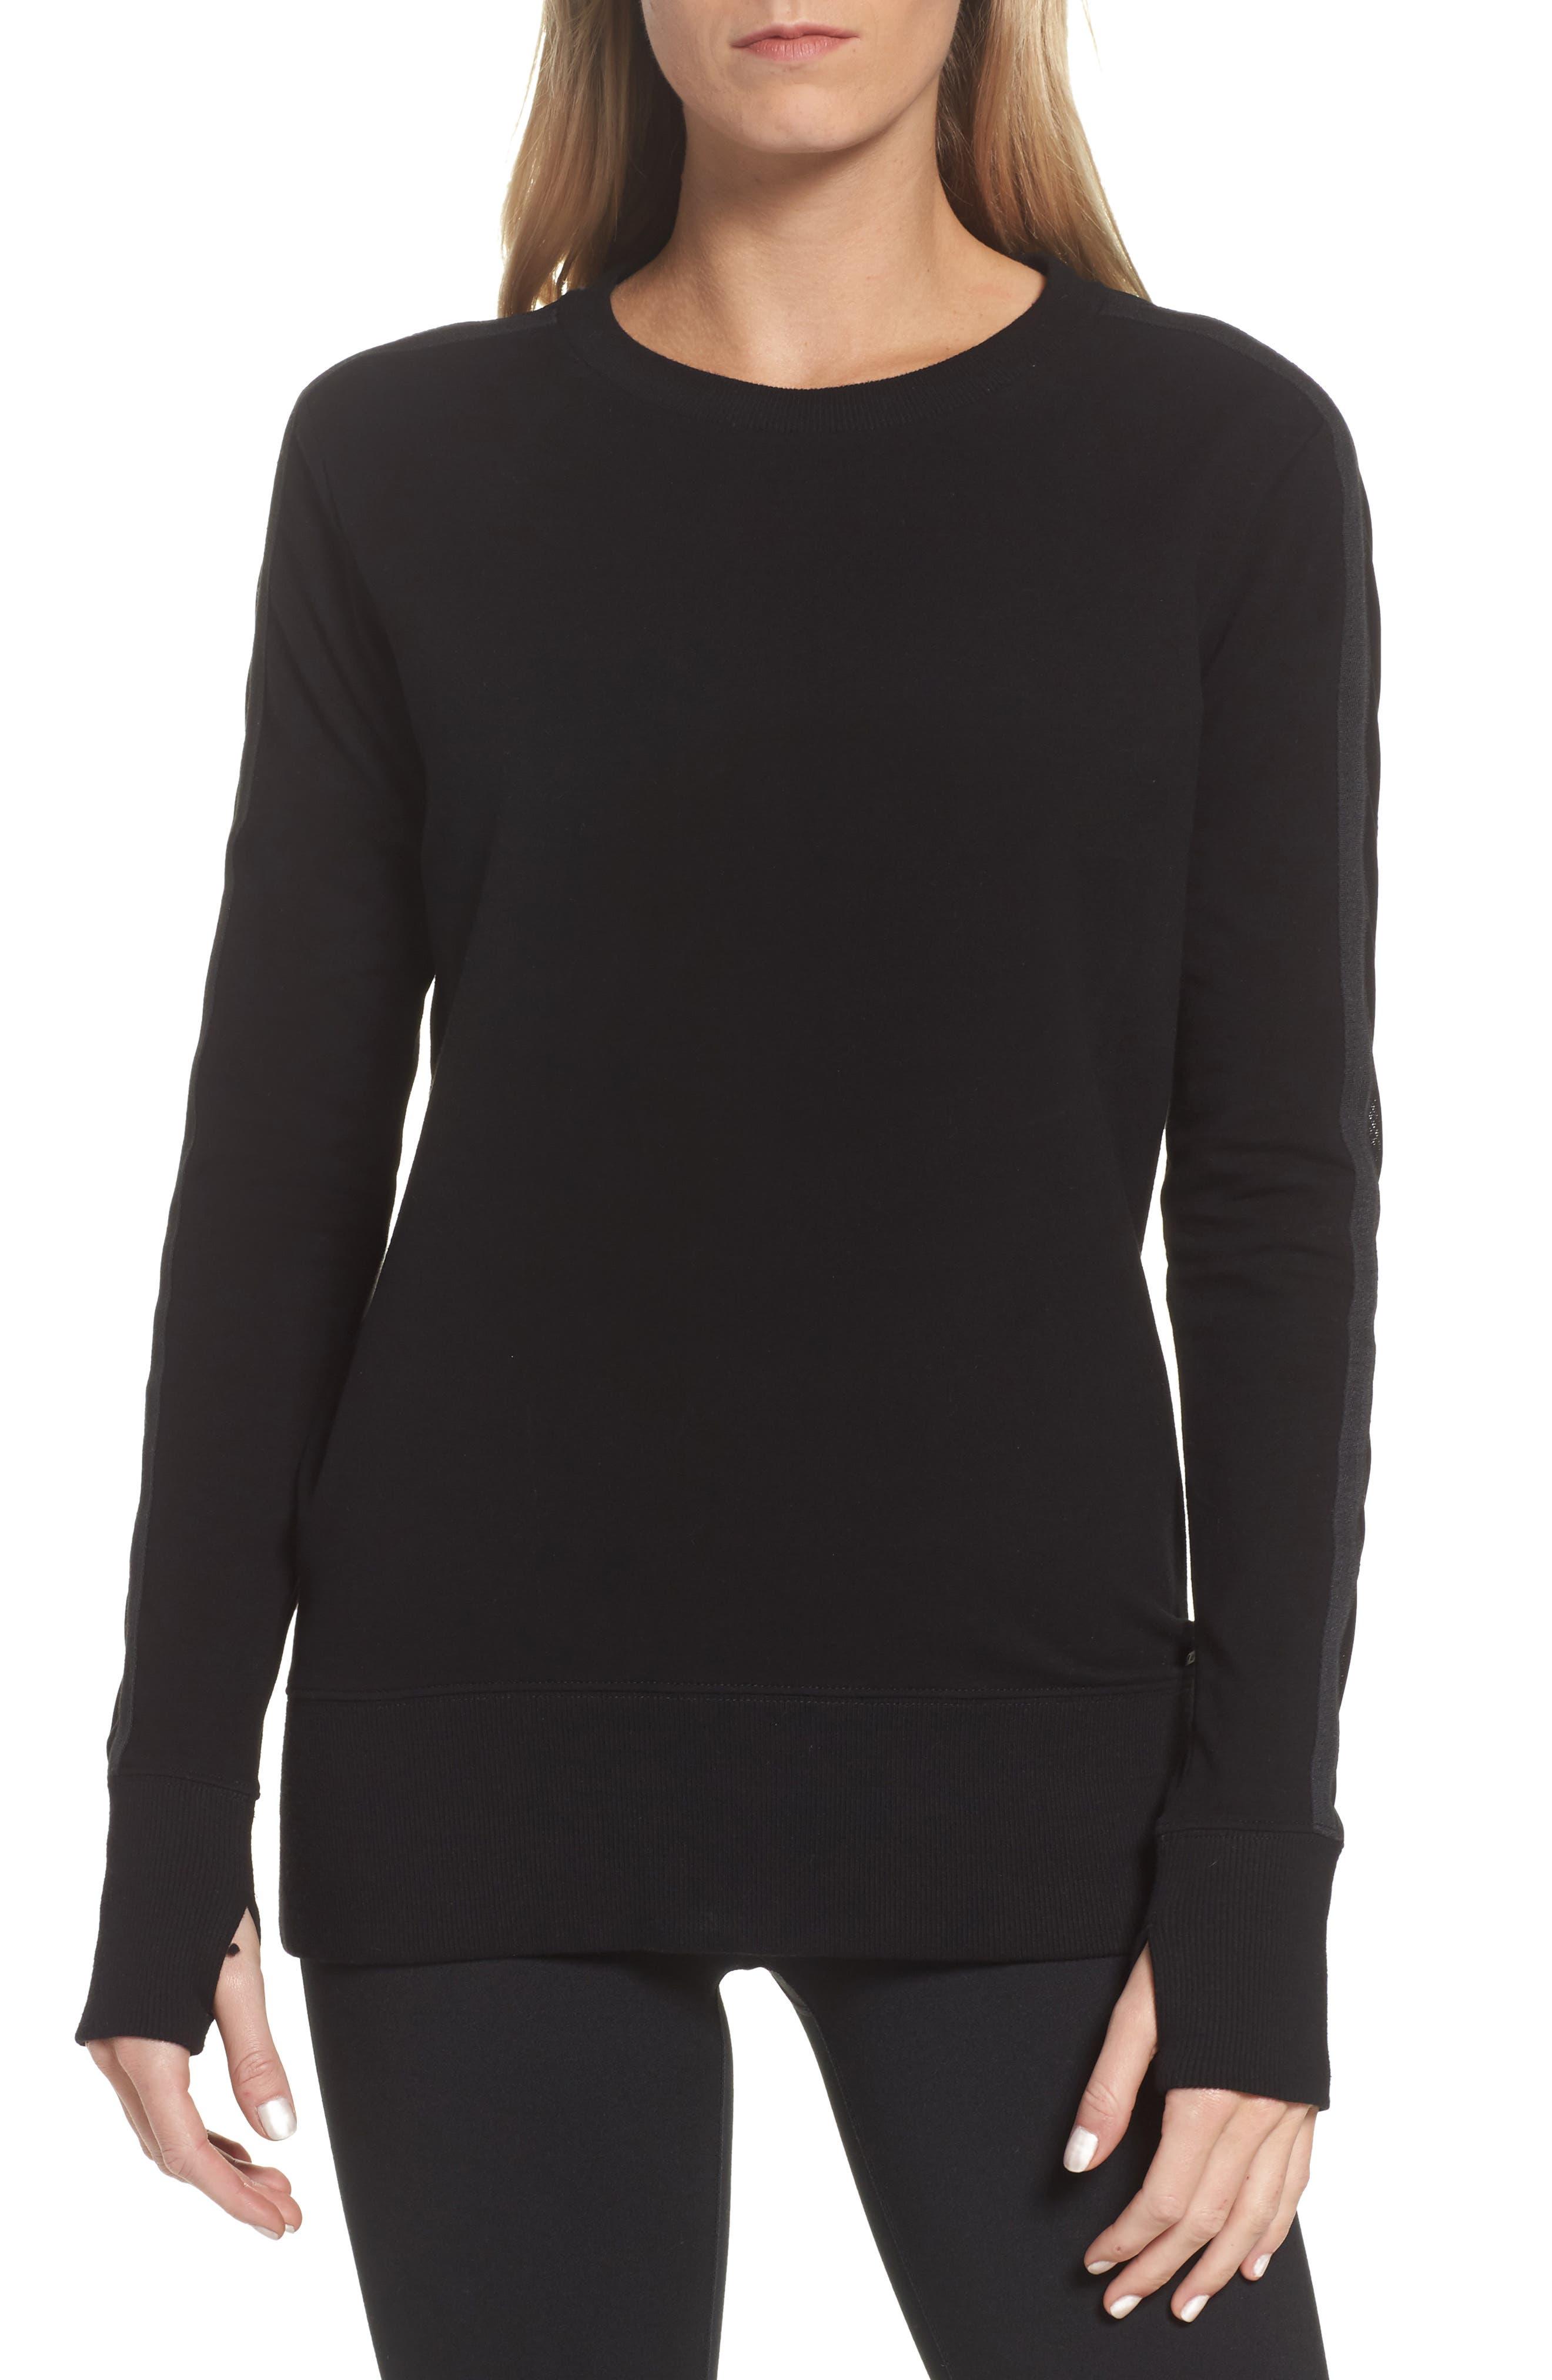 Blanc Noir Social Sweatshirt